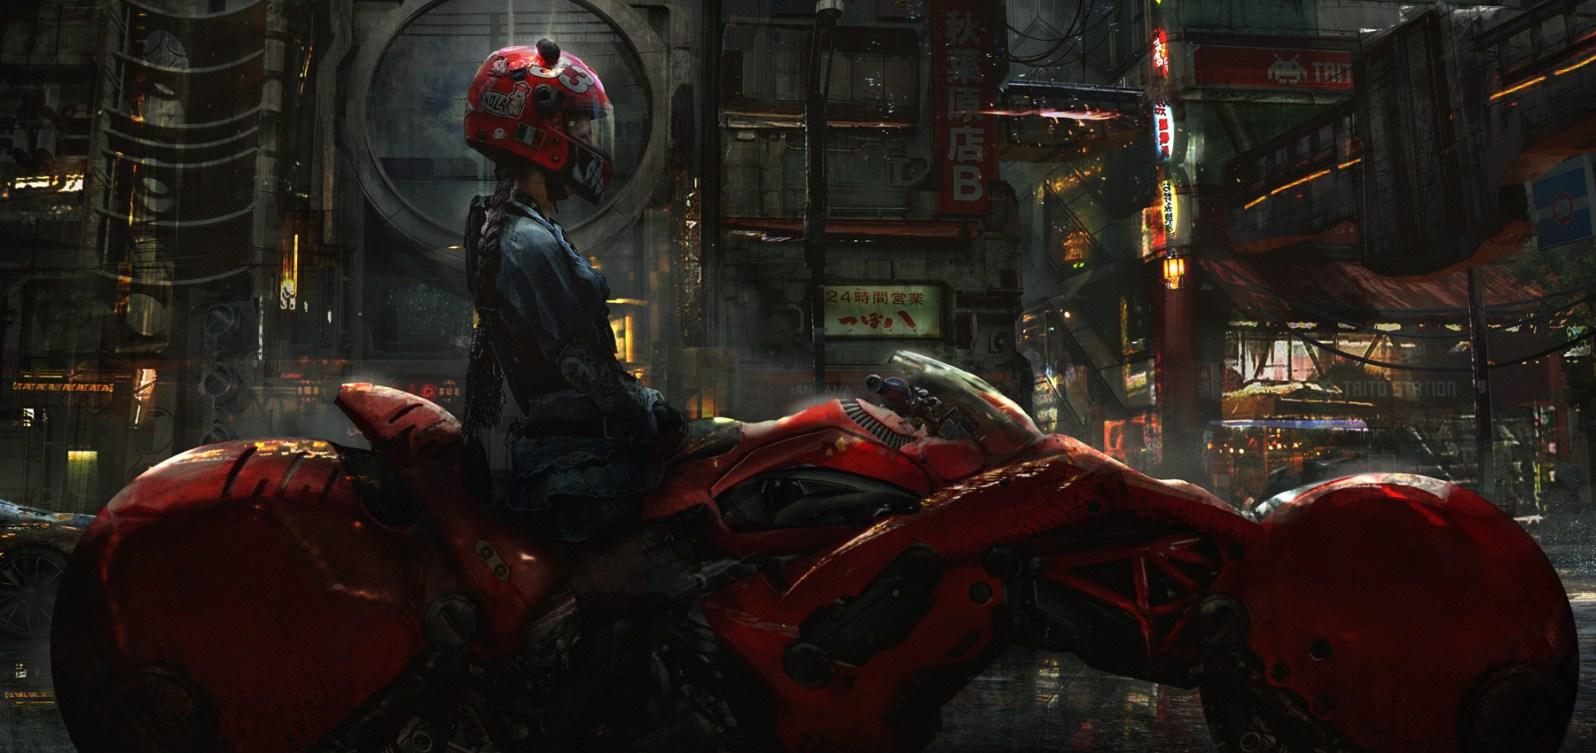 Eddie Mendoza - Biker Girl